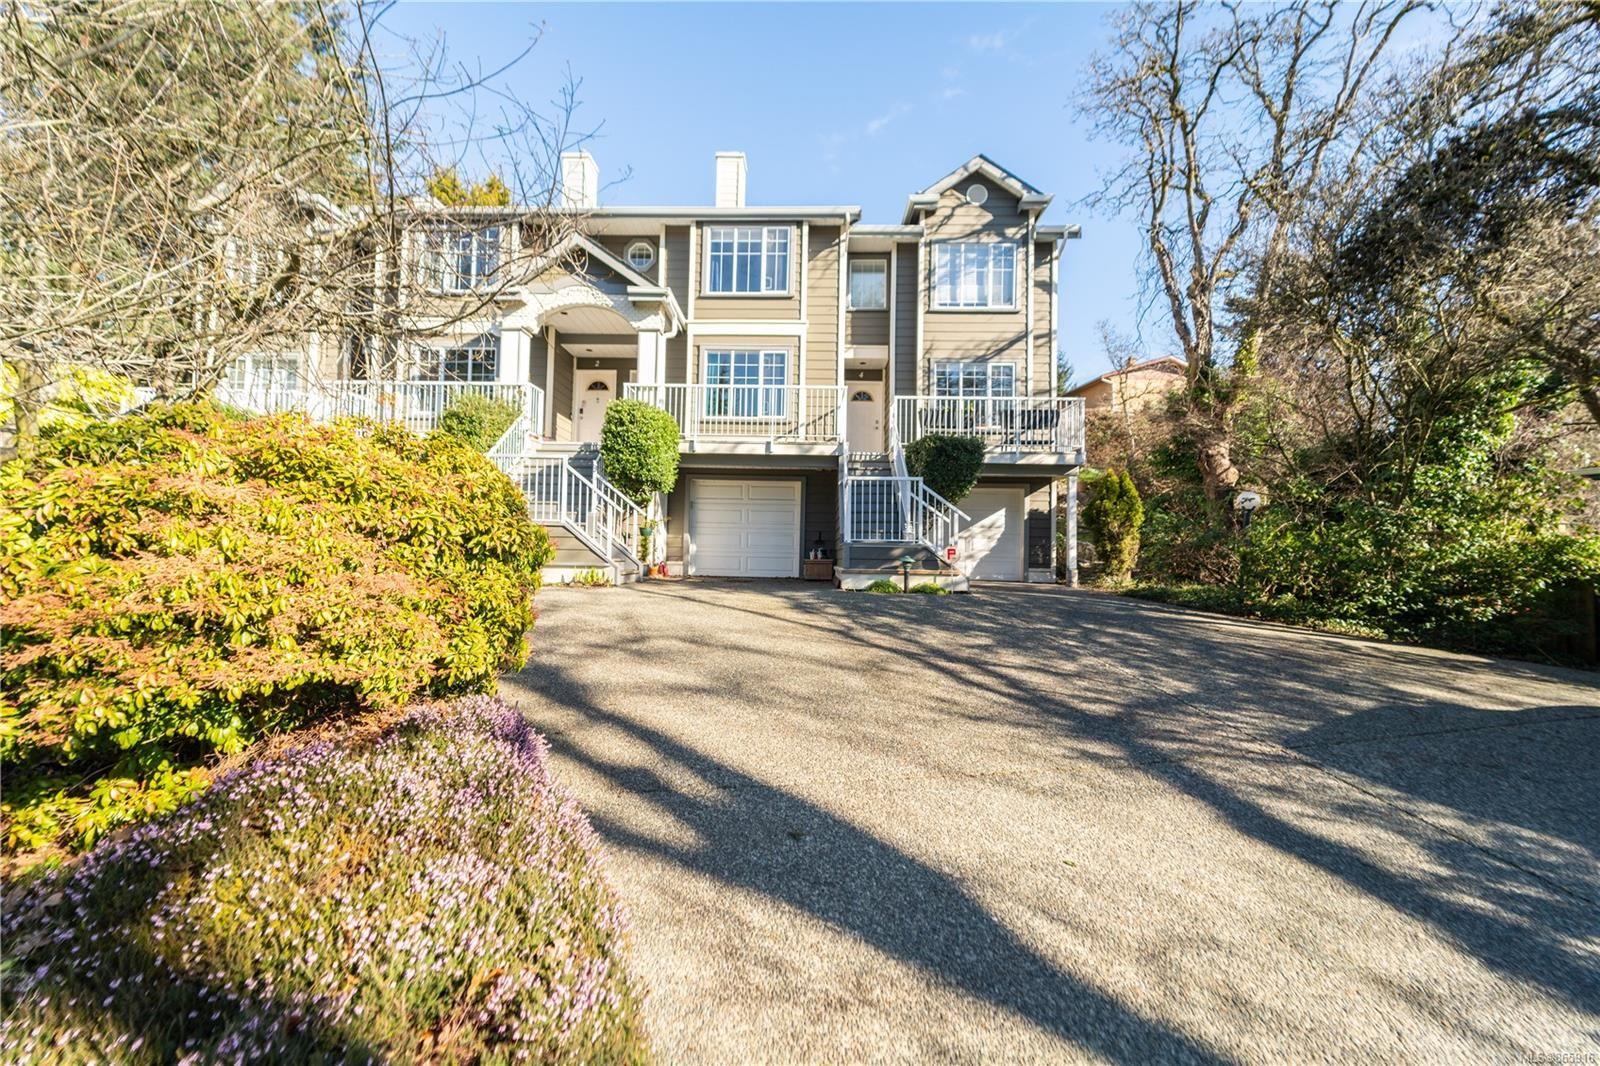 Main Photo: 4 906 Admirals Rd in : Es Gorge Vale Row/Townhouse for sale (Esquimalt)  : MLS®# 865916